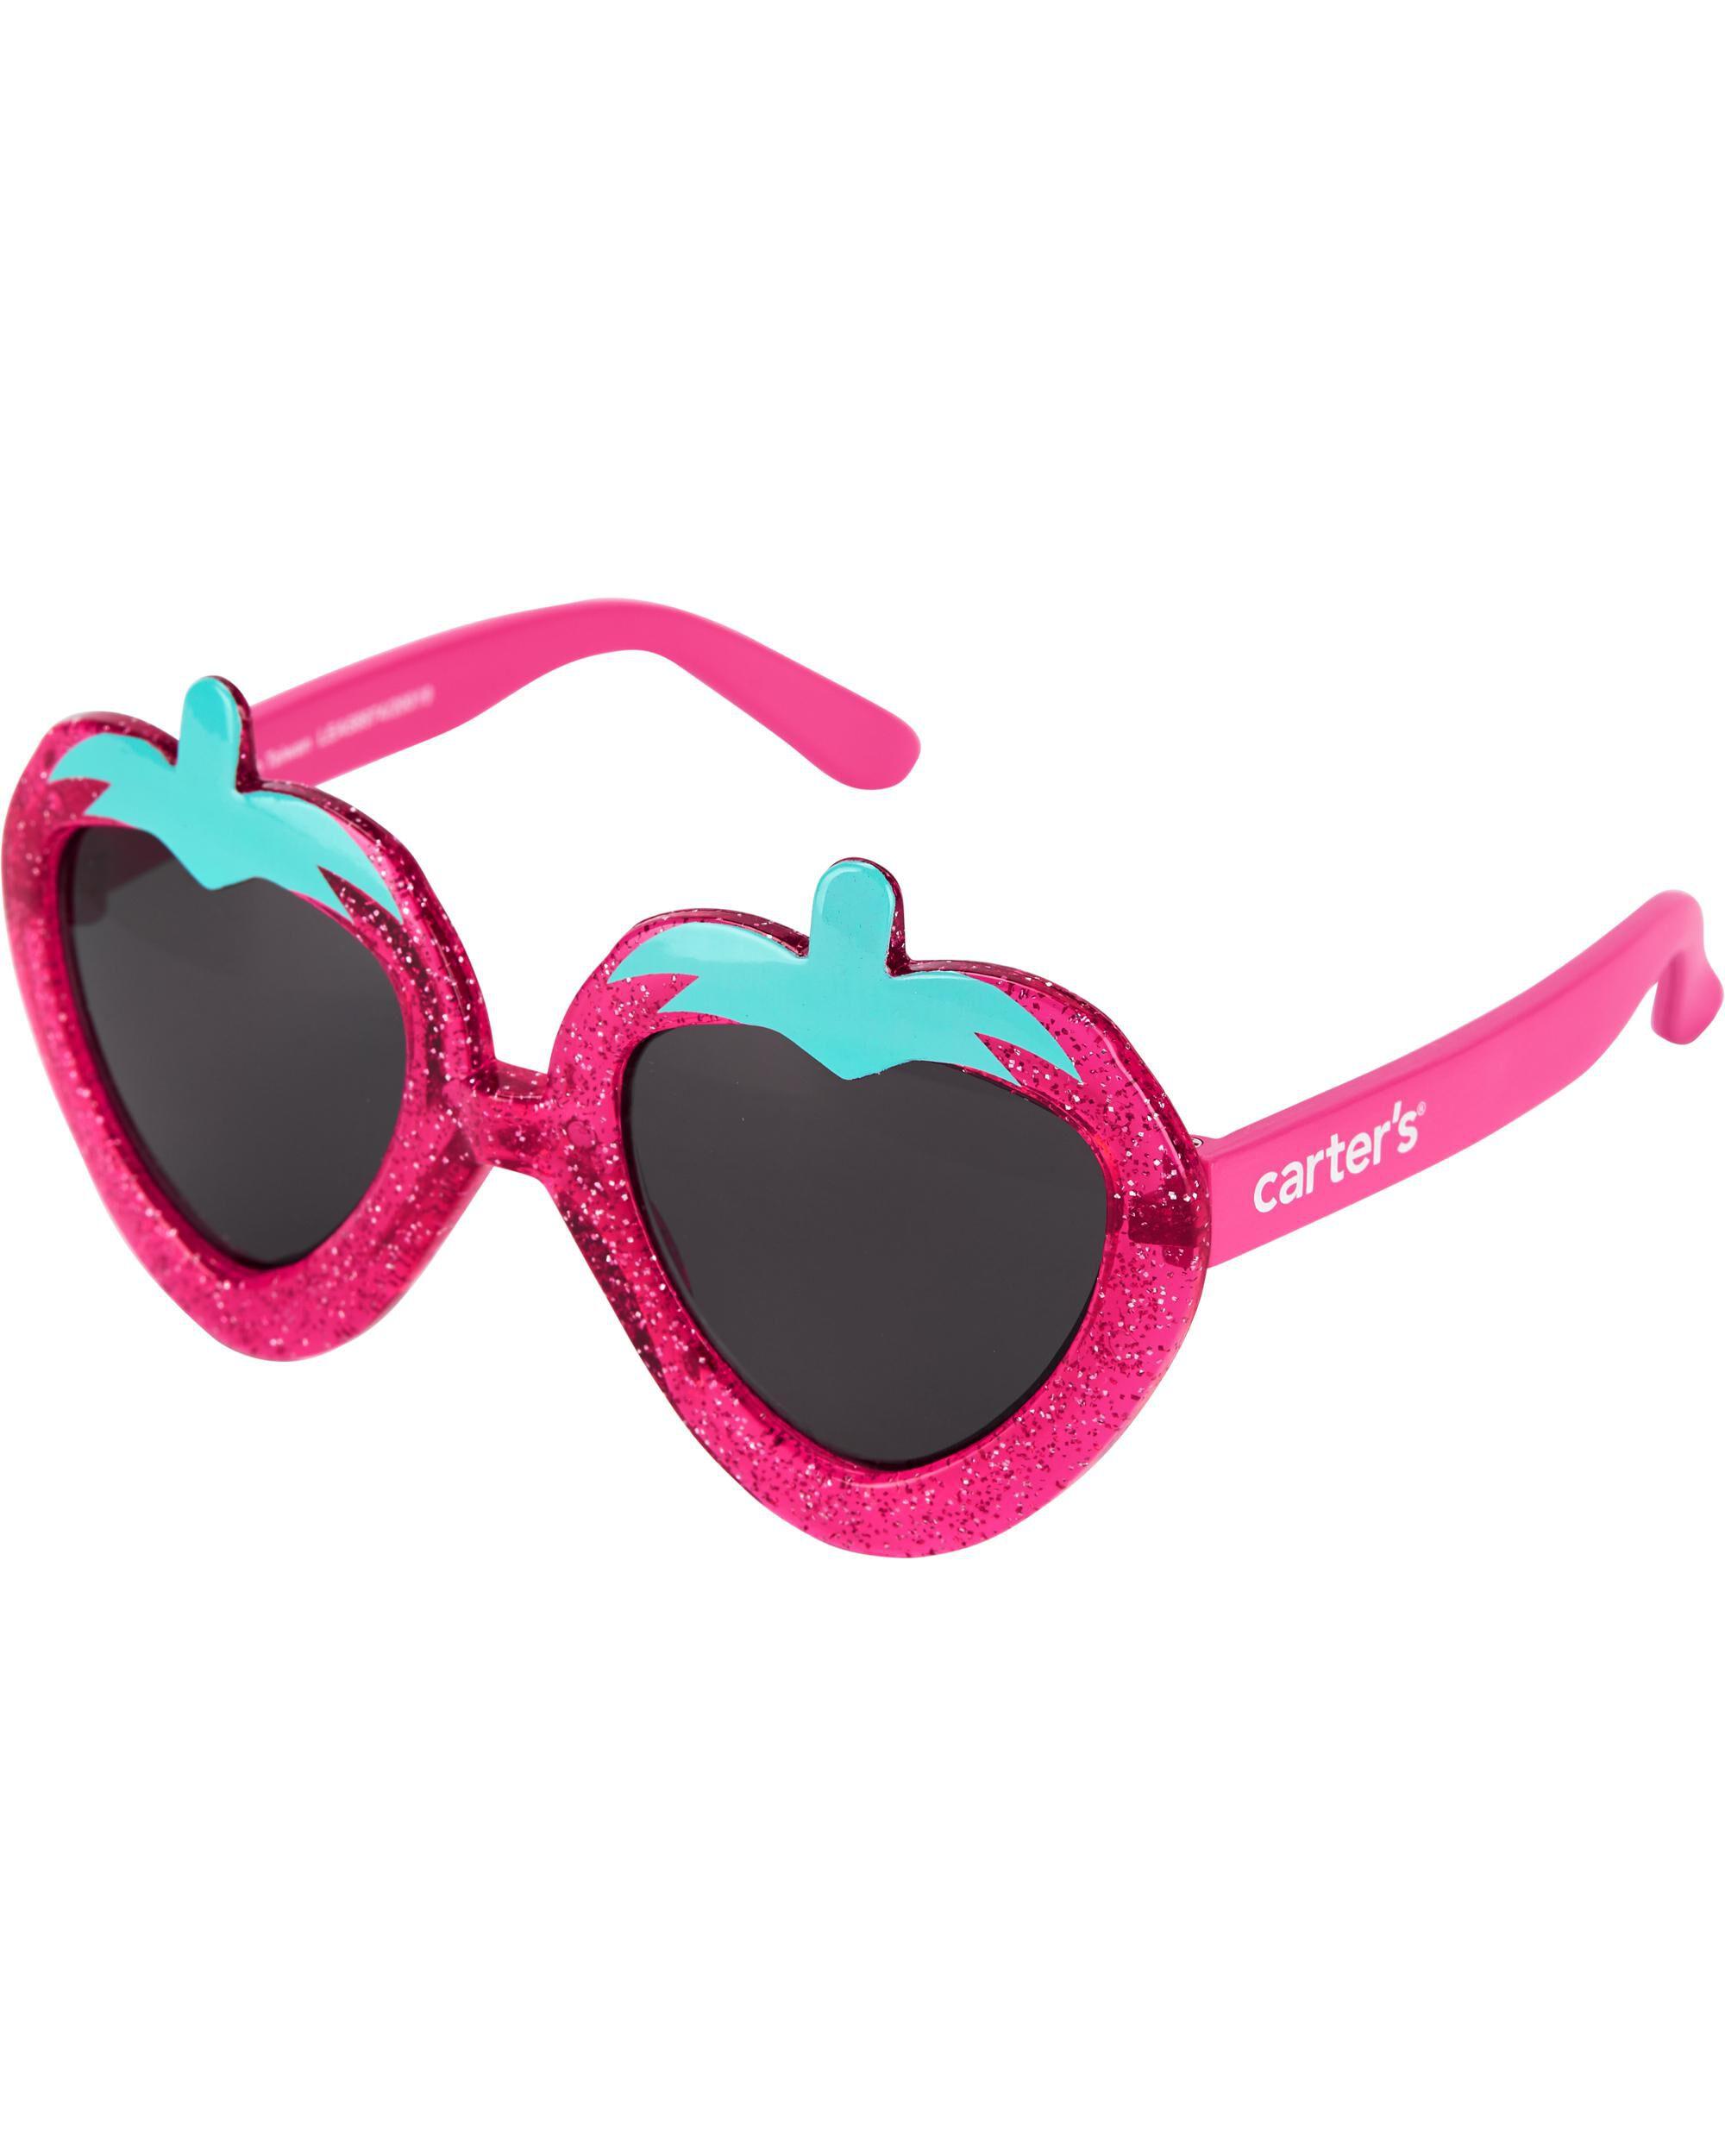 Strawberry Sunglasses